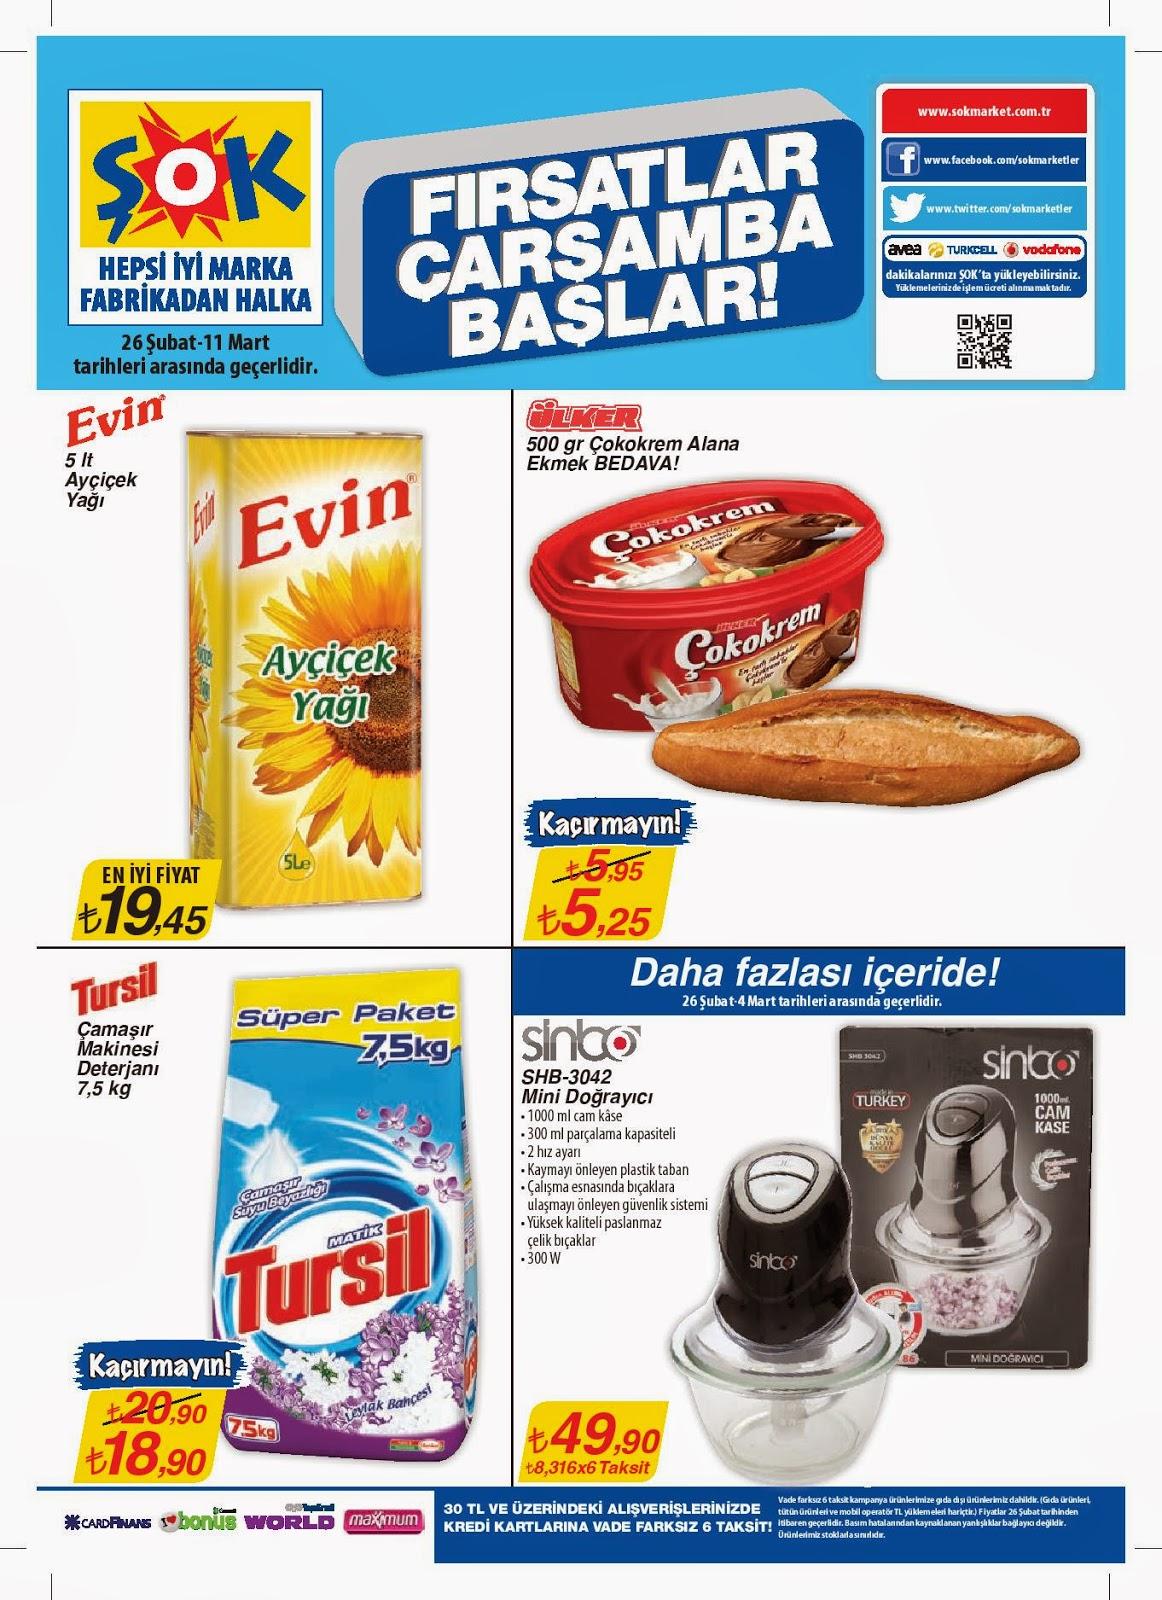 http://haberfirsat.blogspot.com.tr/2014/02/sok-26-subat-2014-aktuel-urunler.html